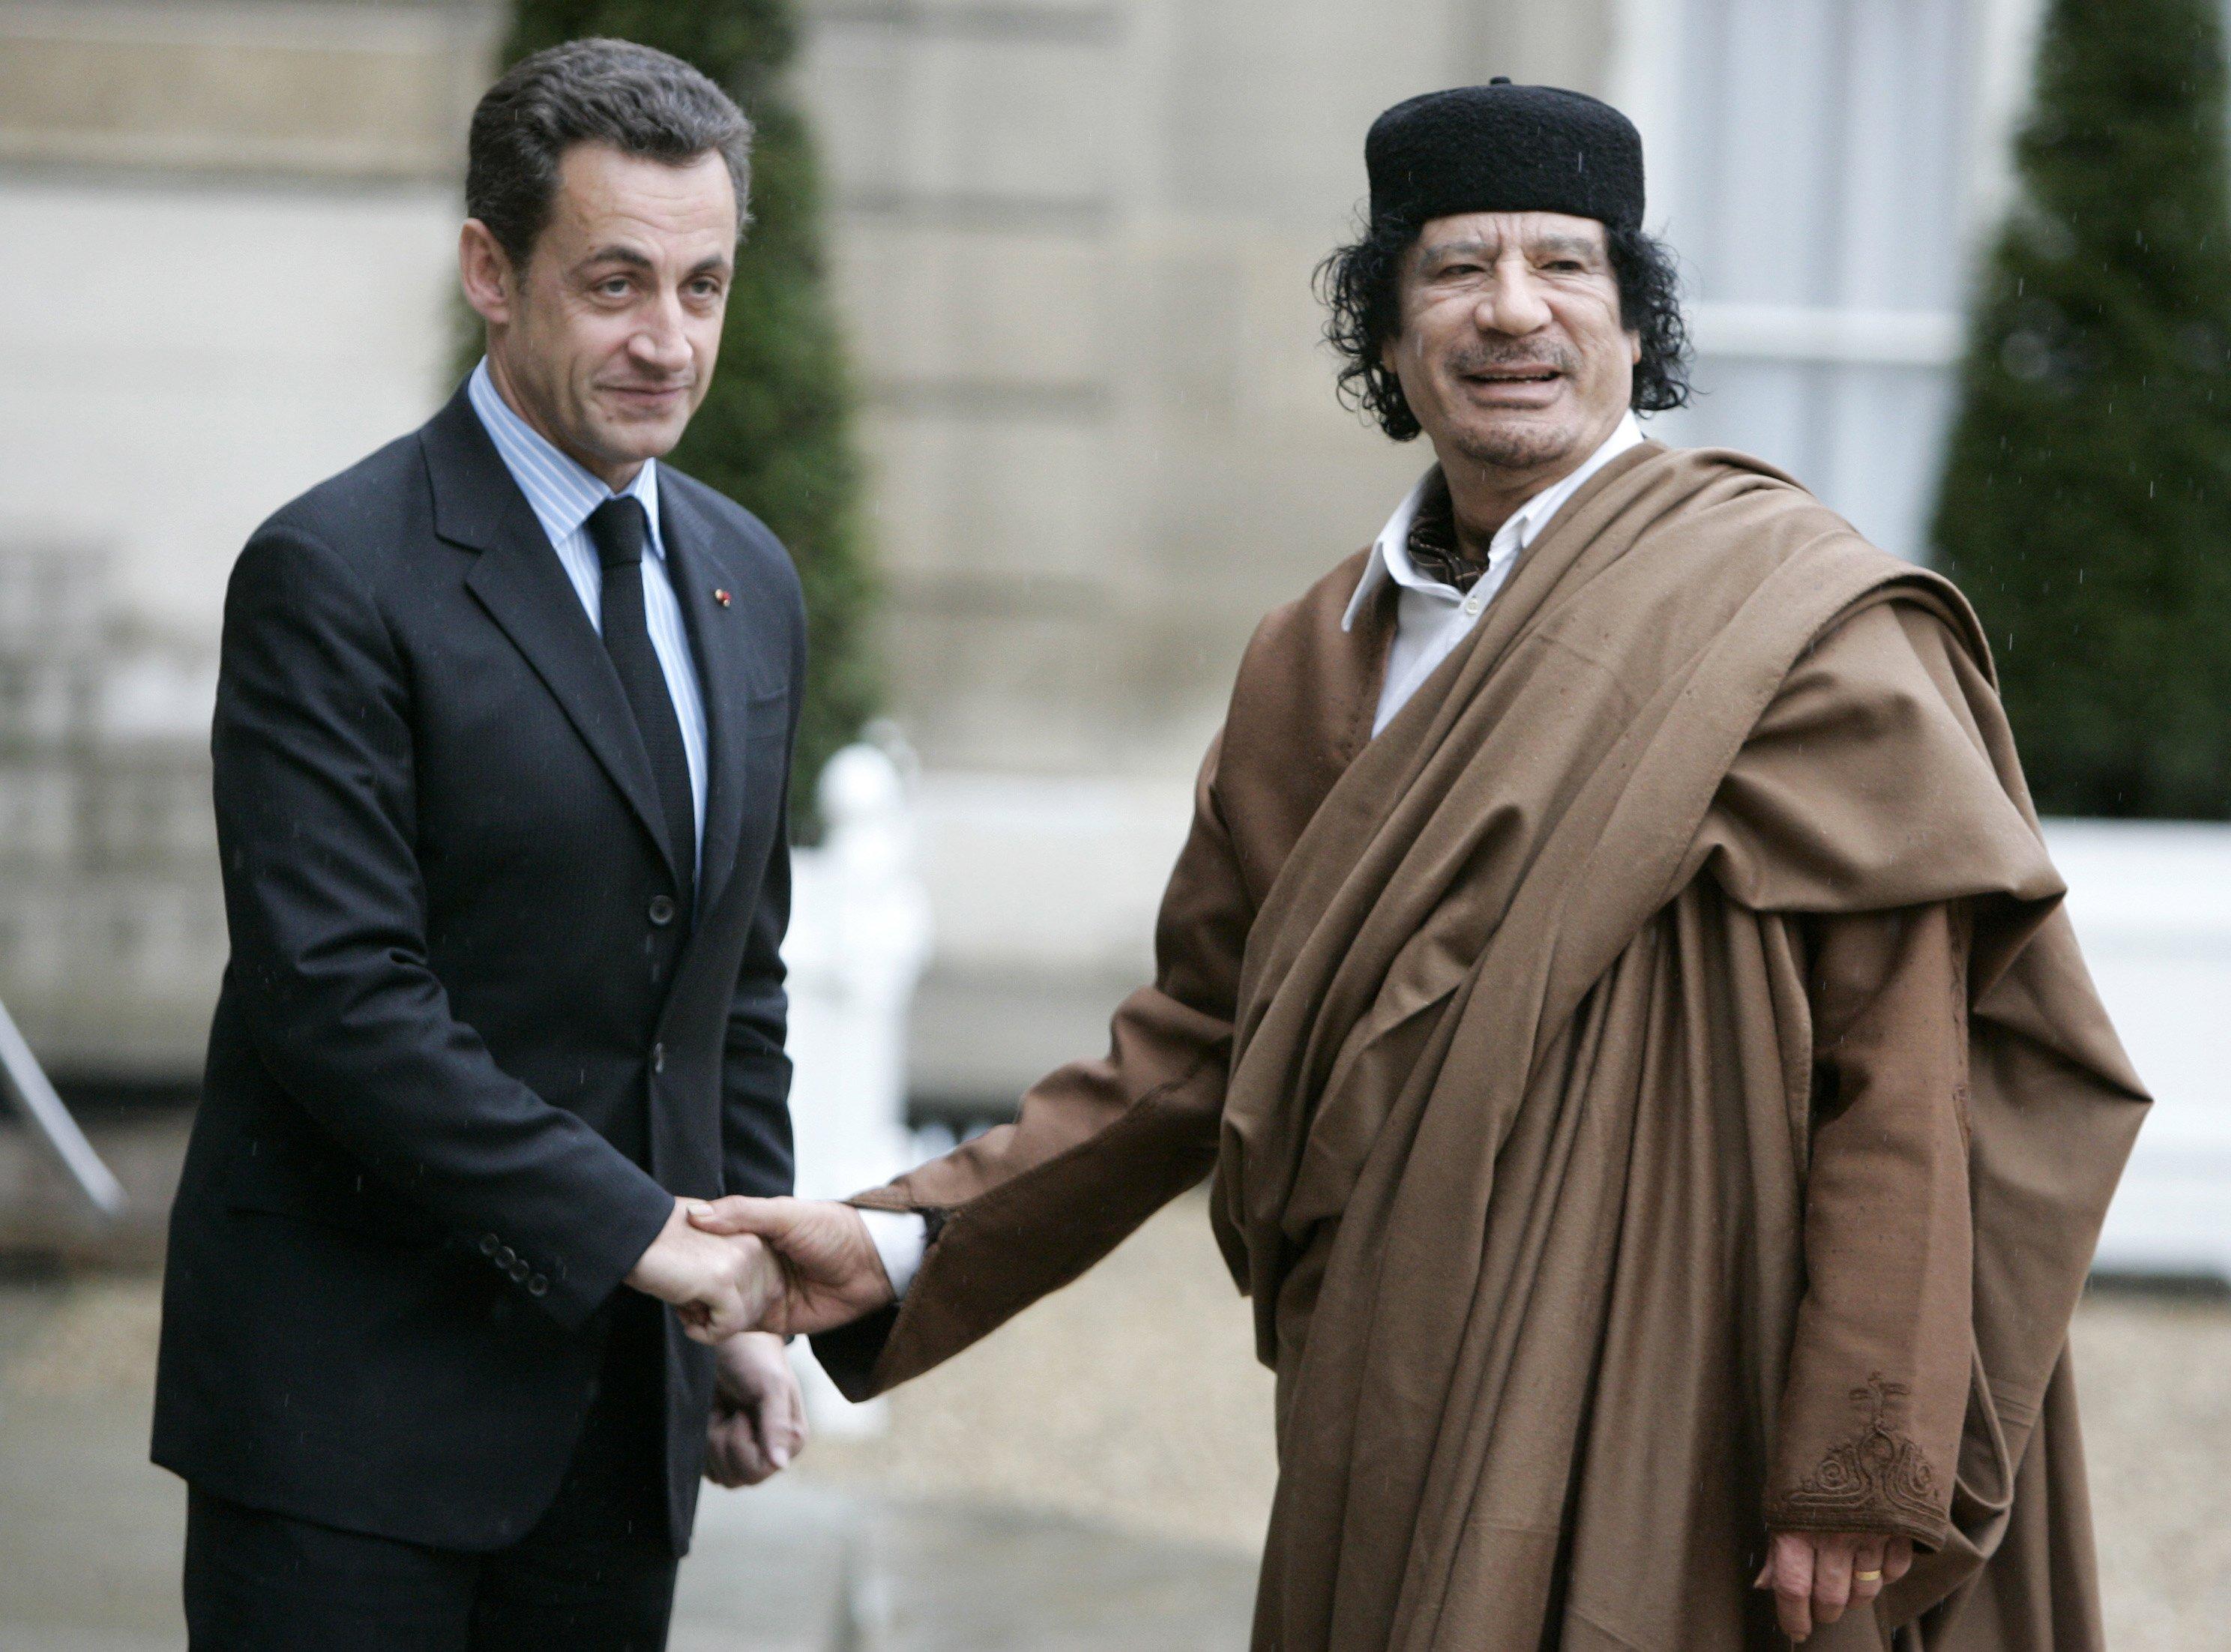 Ex-French president Sarkozy held on Gadhafi claims